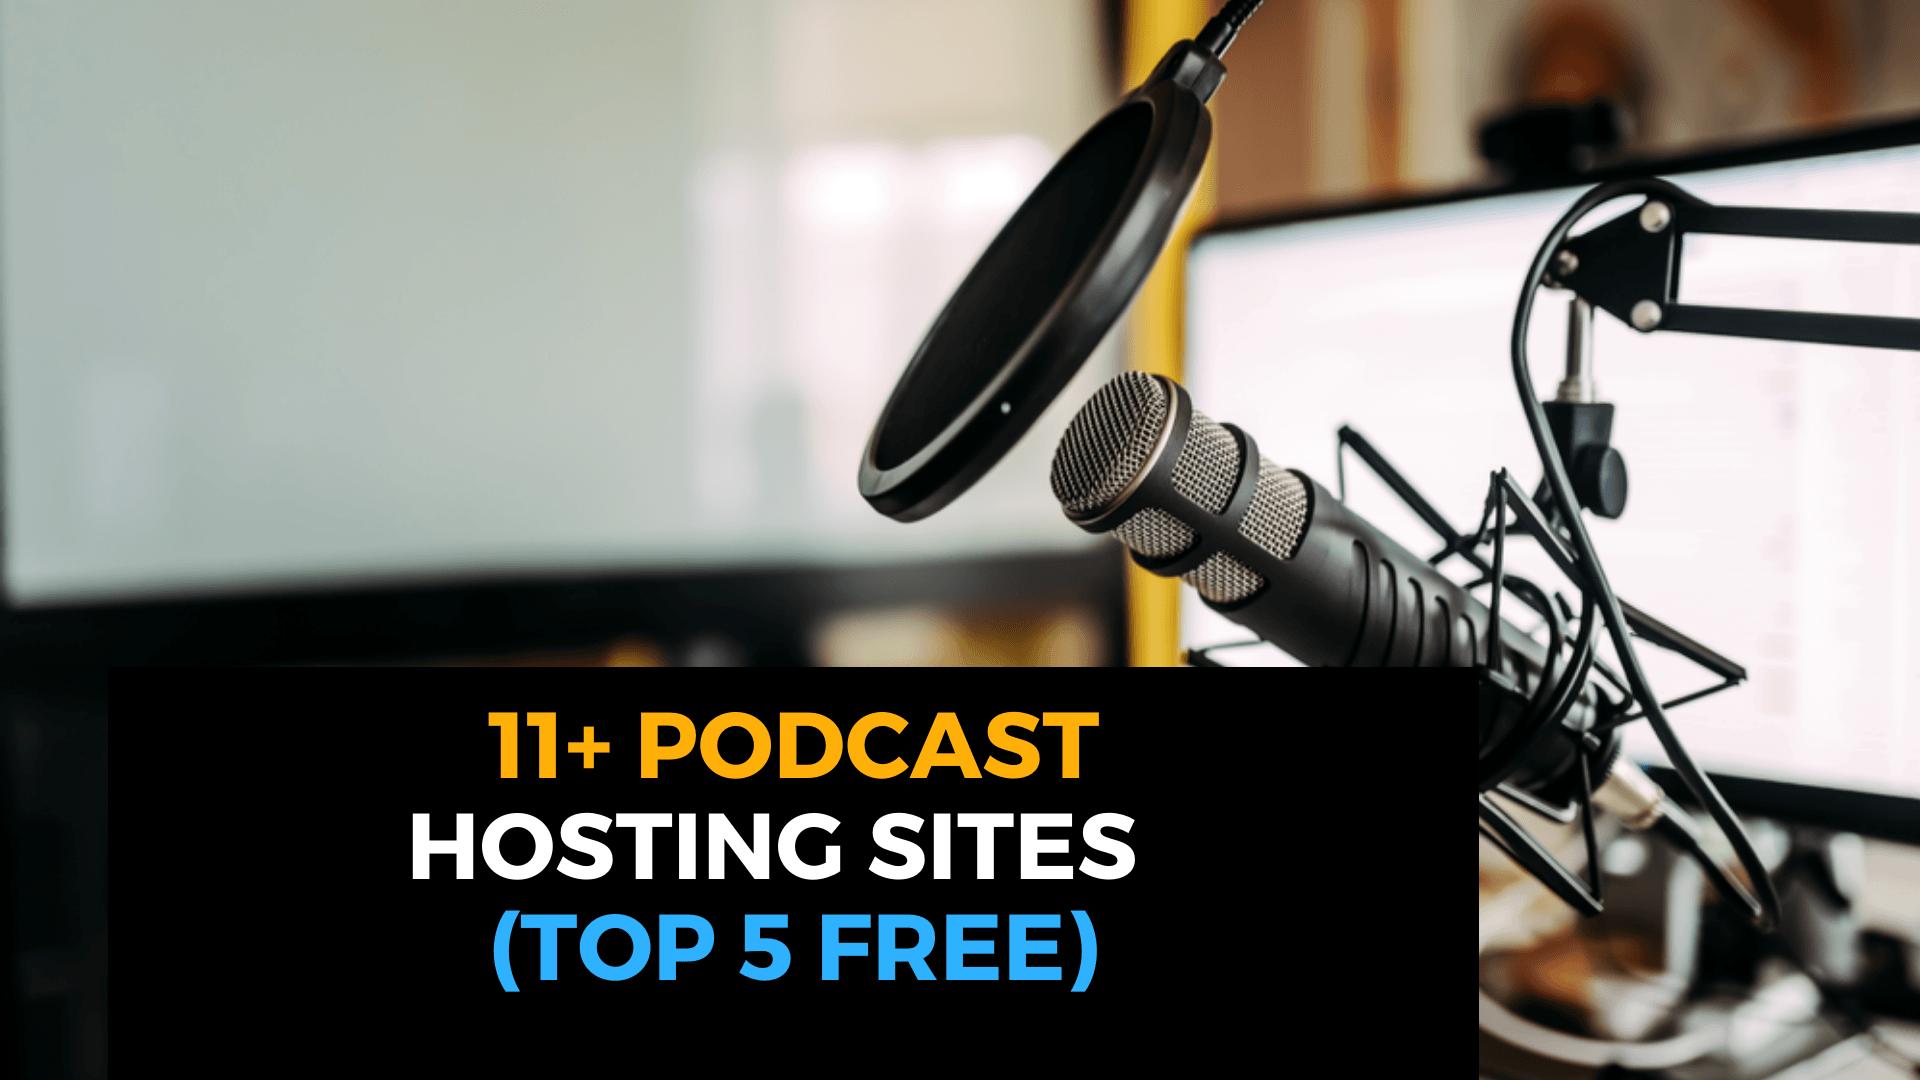 Best Podcasting Hosting Sites